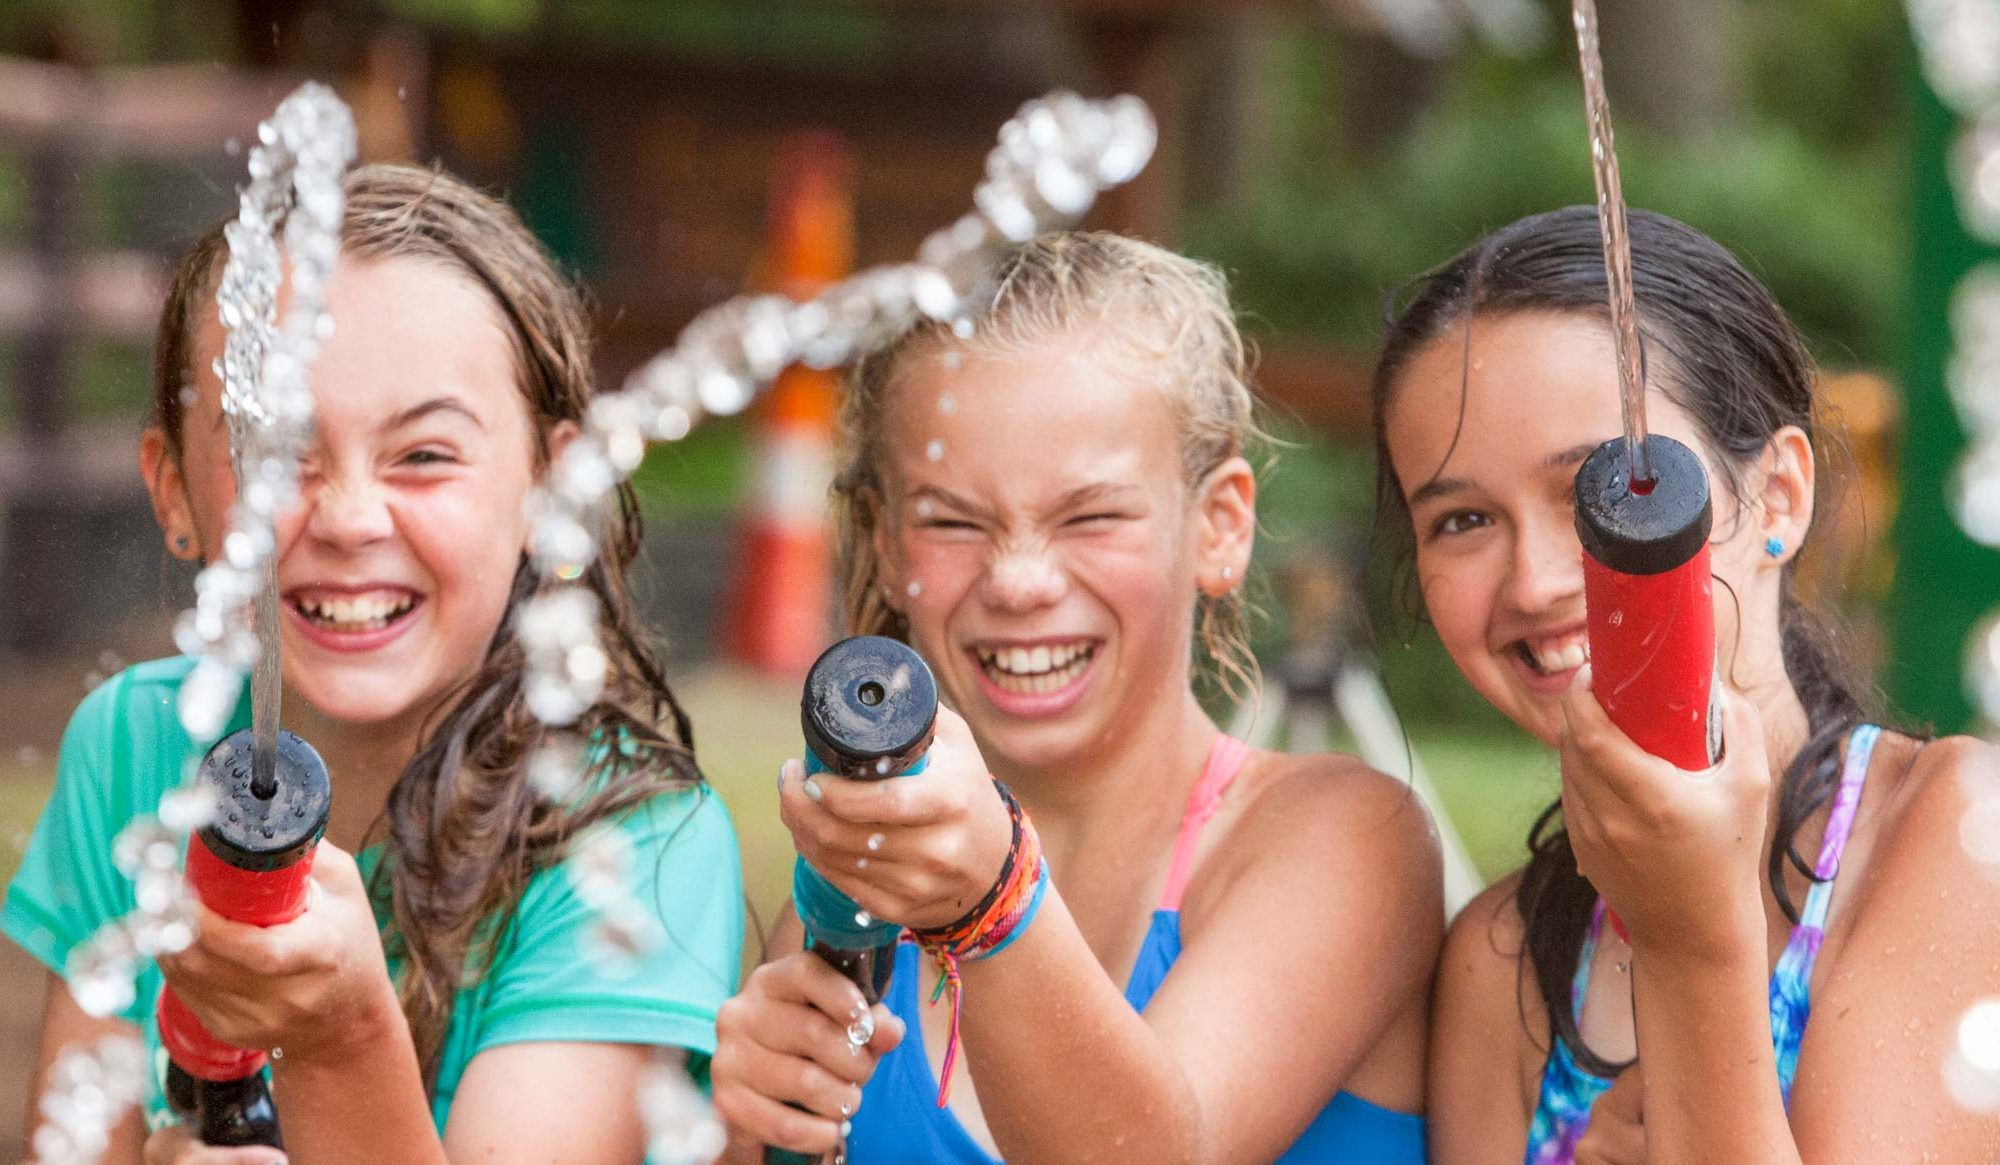 Girls squirting water guns